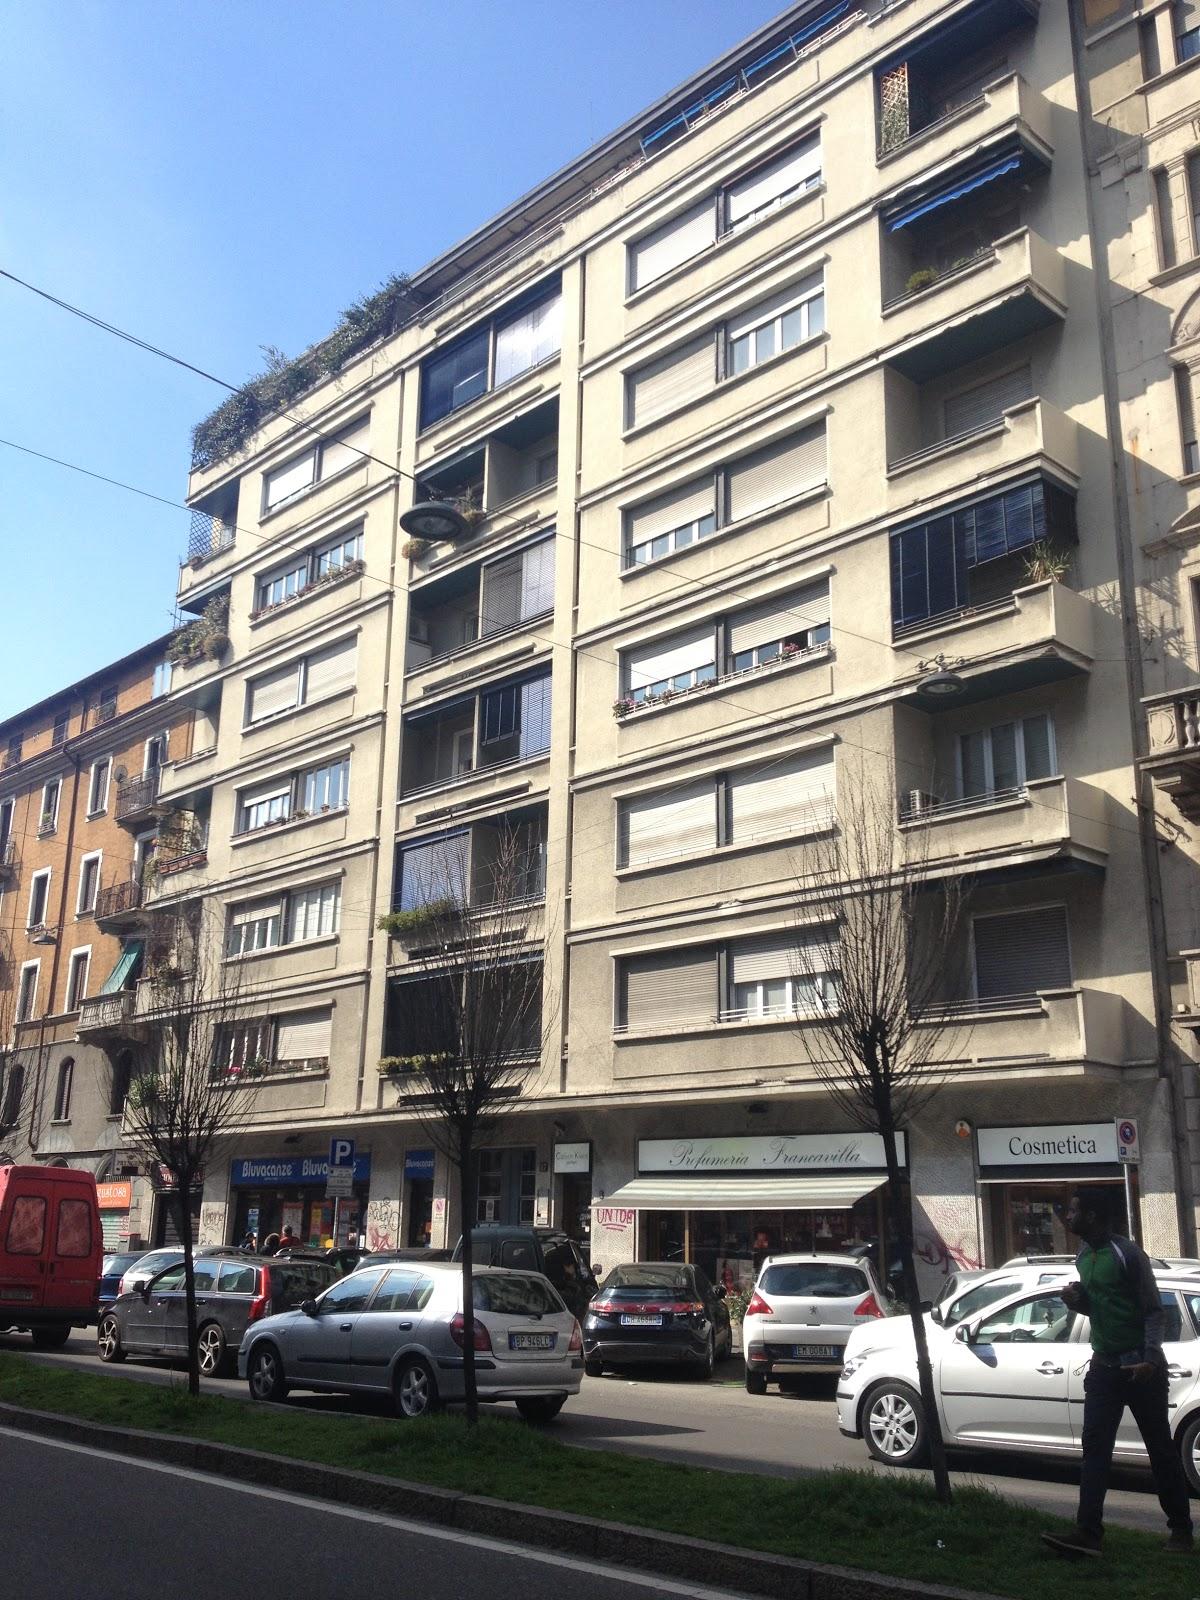 Urbanfile milano zona monza viale monza 87 - Arredo bagno viale monza milano ...